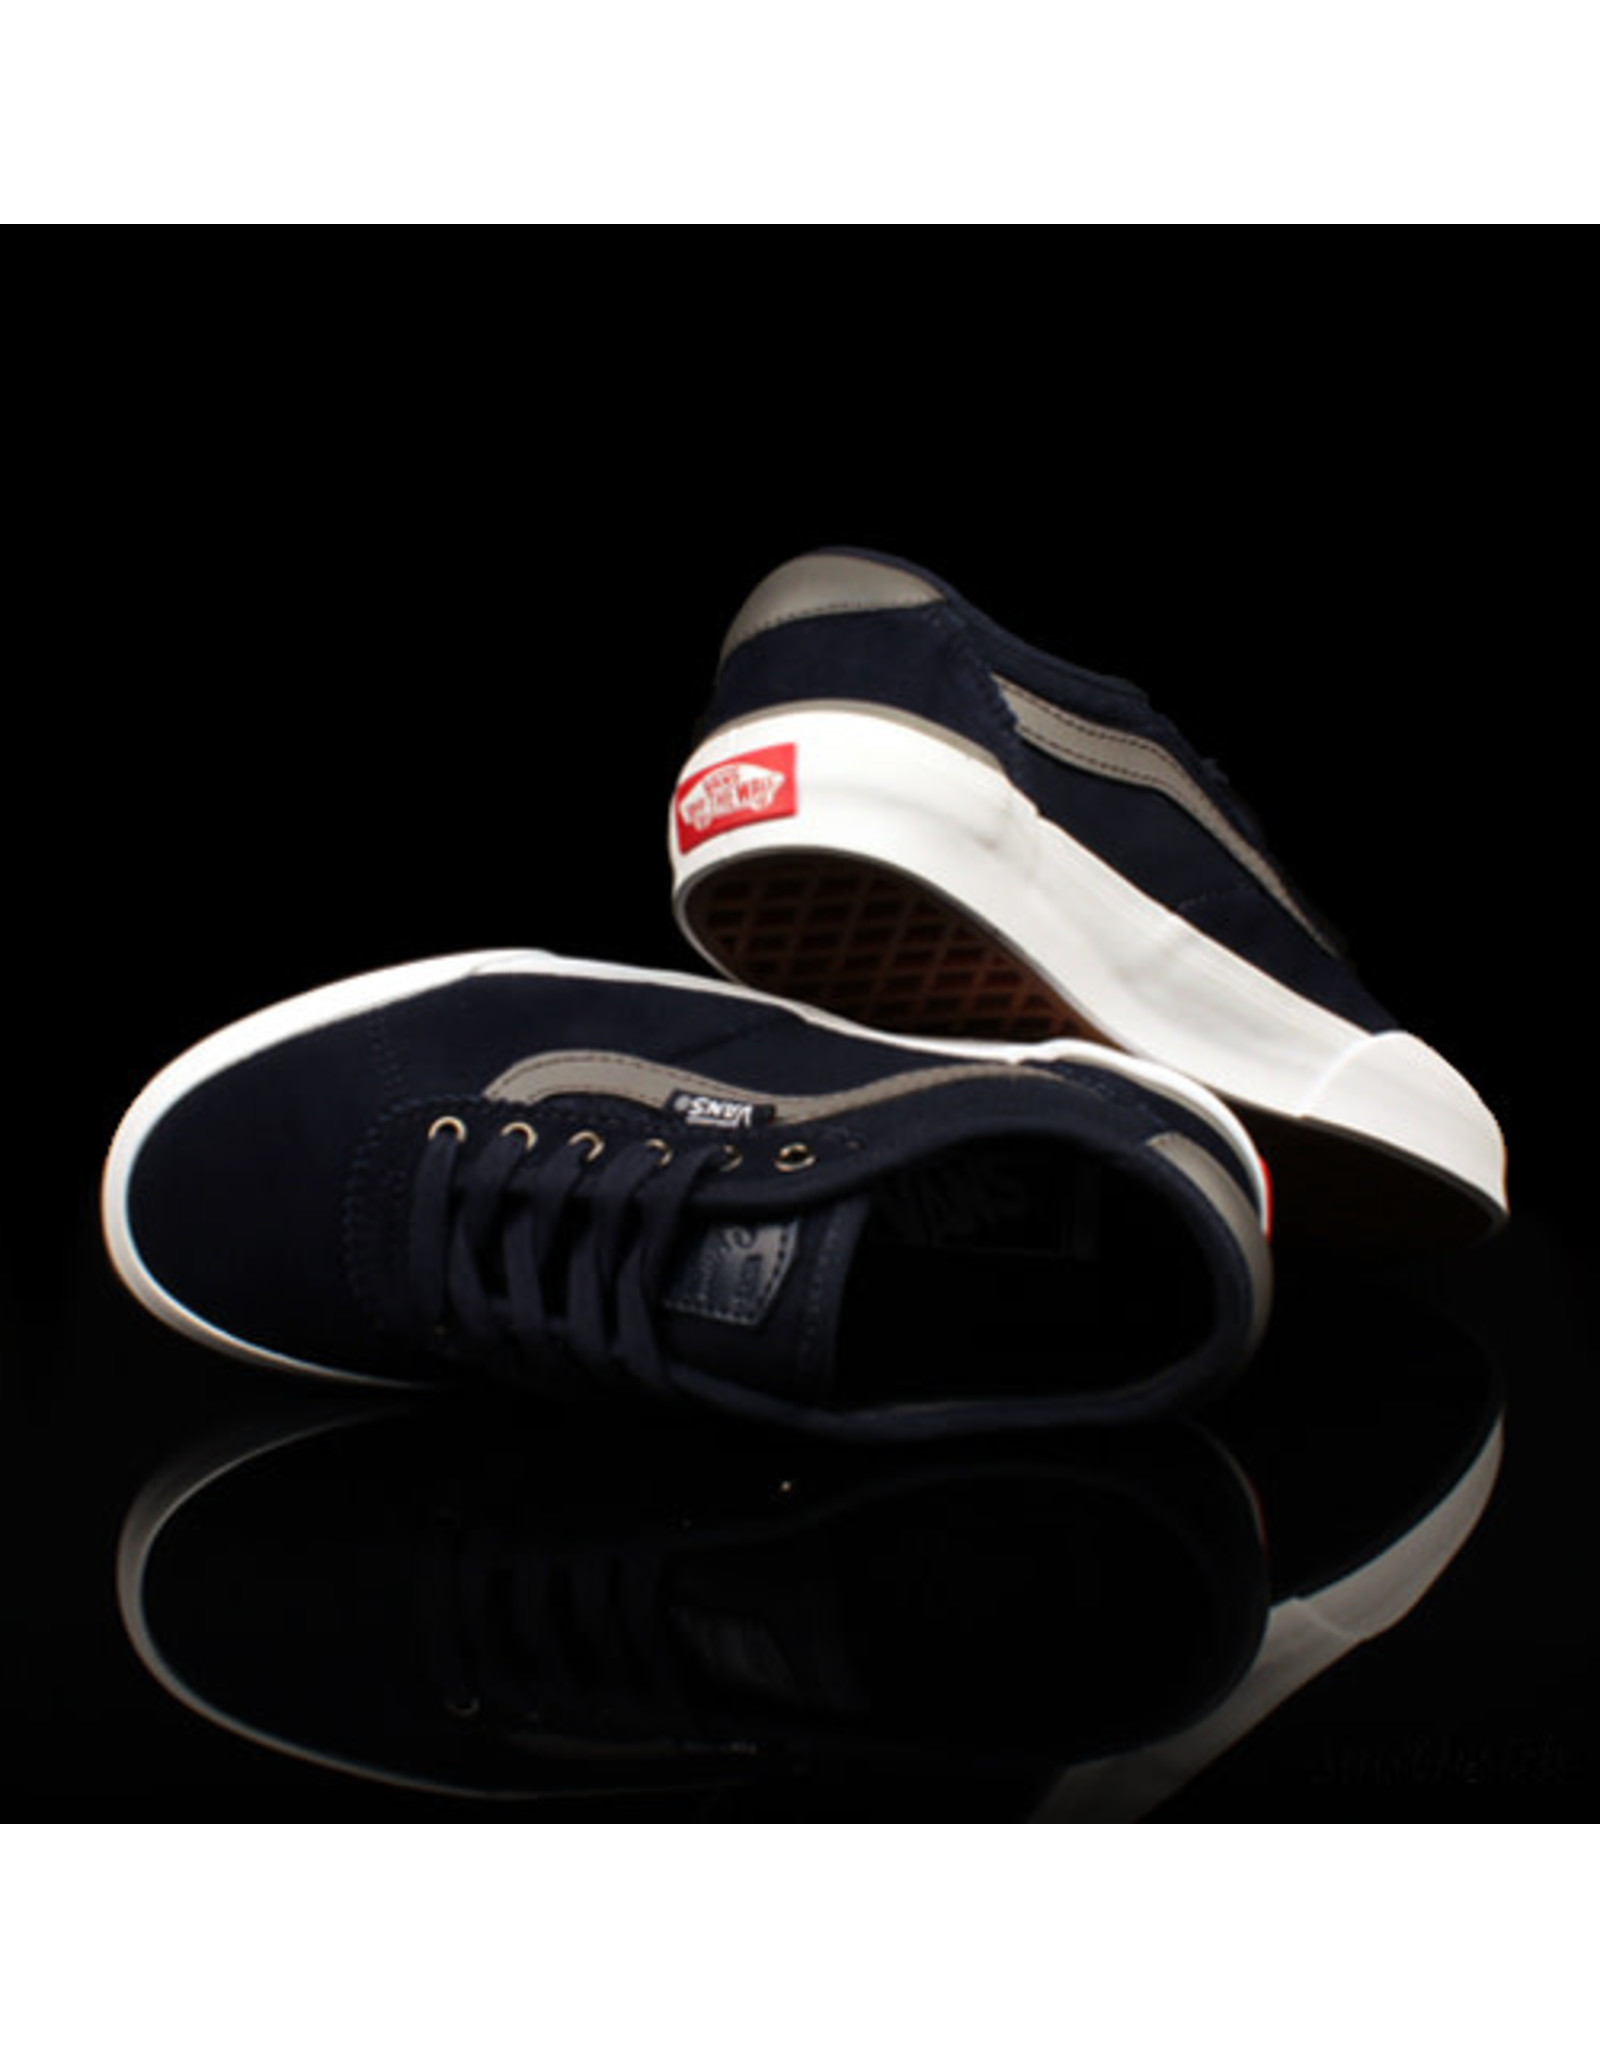 VANS Vans Chima Pro 2 YOUTH Blue Shade